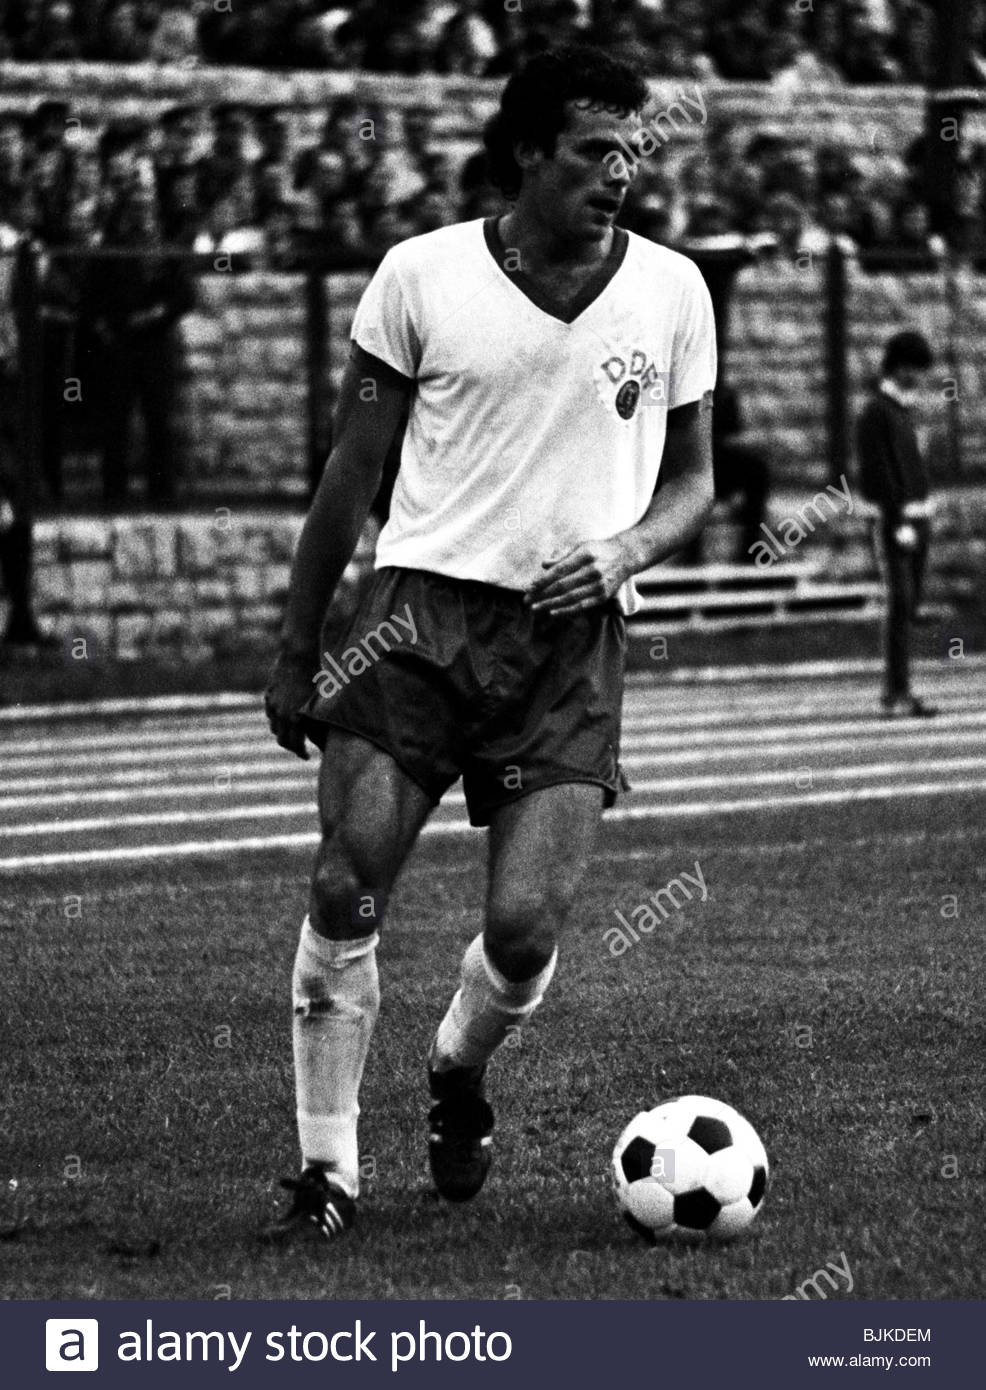 07/09/77 INTERNATIONAL FRIENDLY EAST GERMANY v SCOTLAND (1-0) WELTJUGEND STADIUM - EAST BERLIN Hartmut Schade in - Stock Image